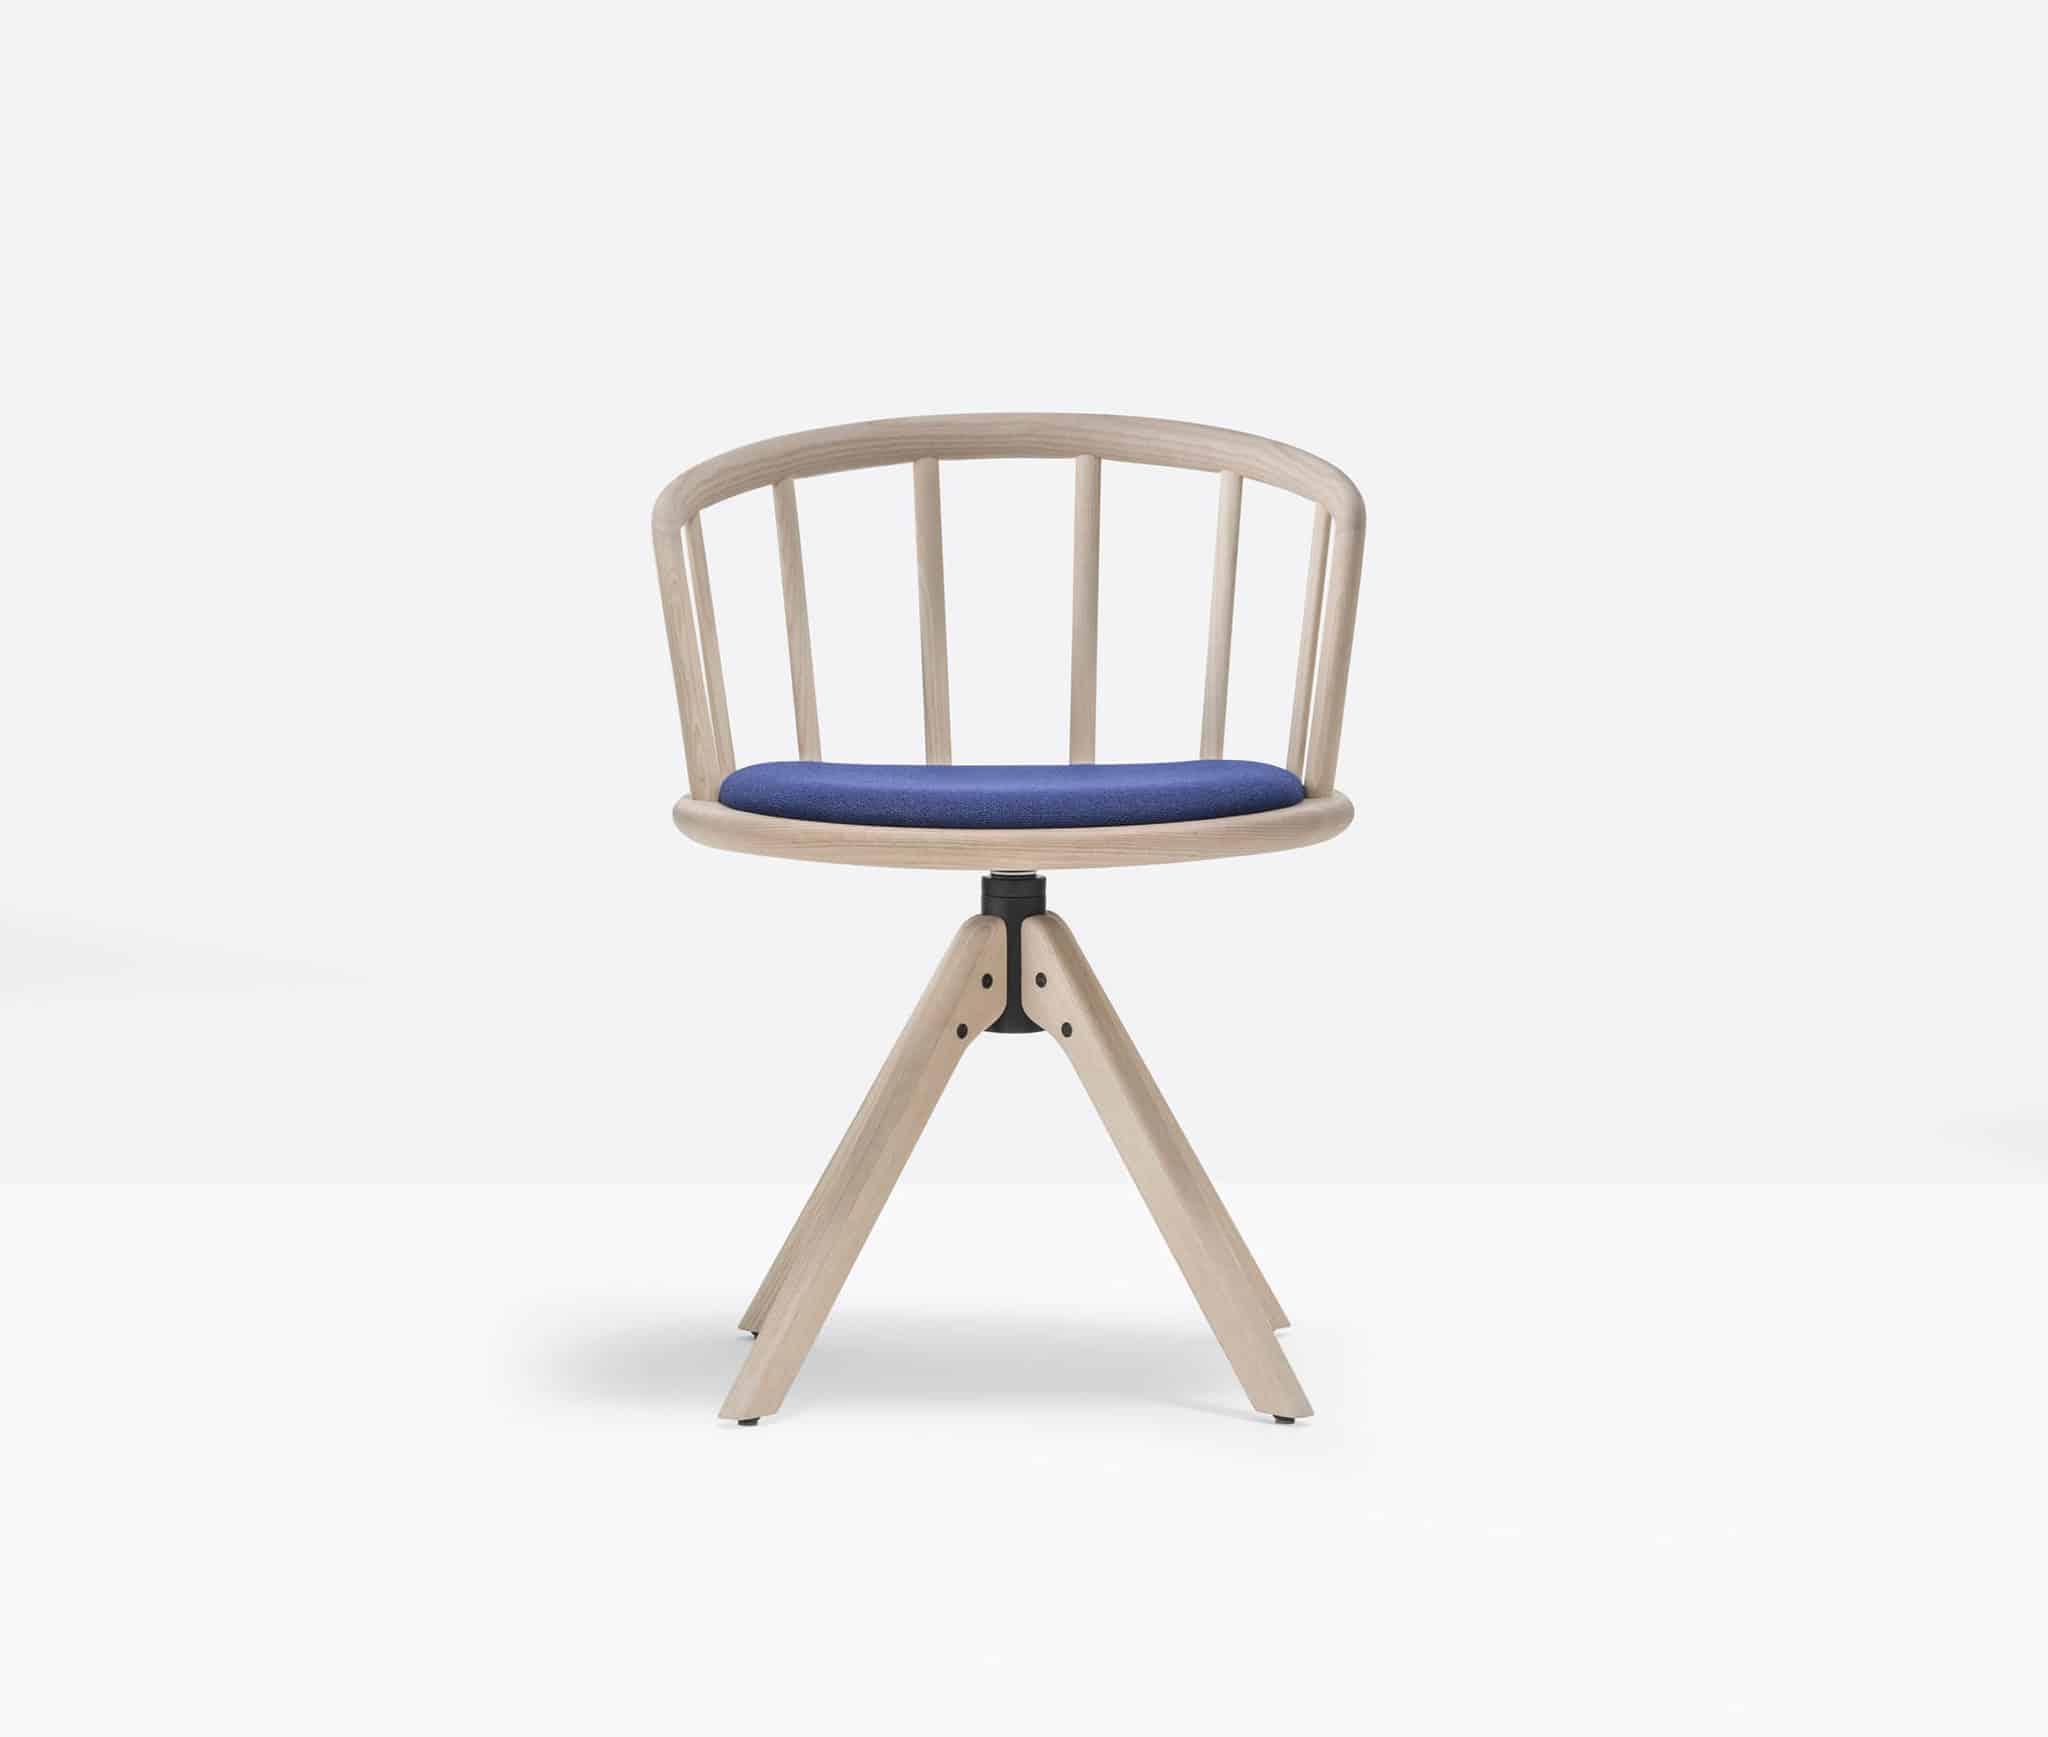 PEDRALI NYM 2846 chaise bois assise tissu pivotante